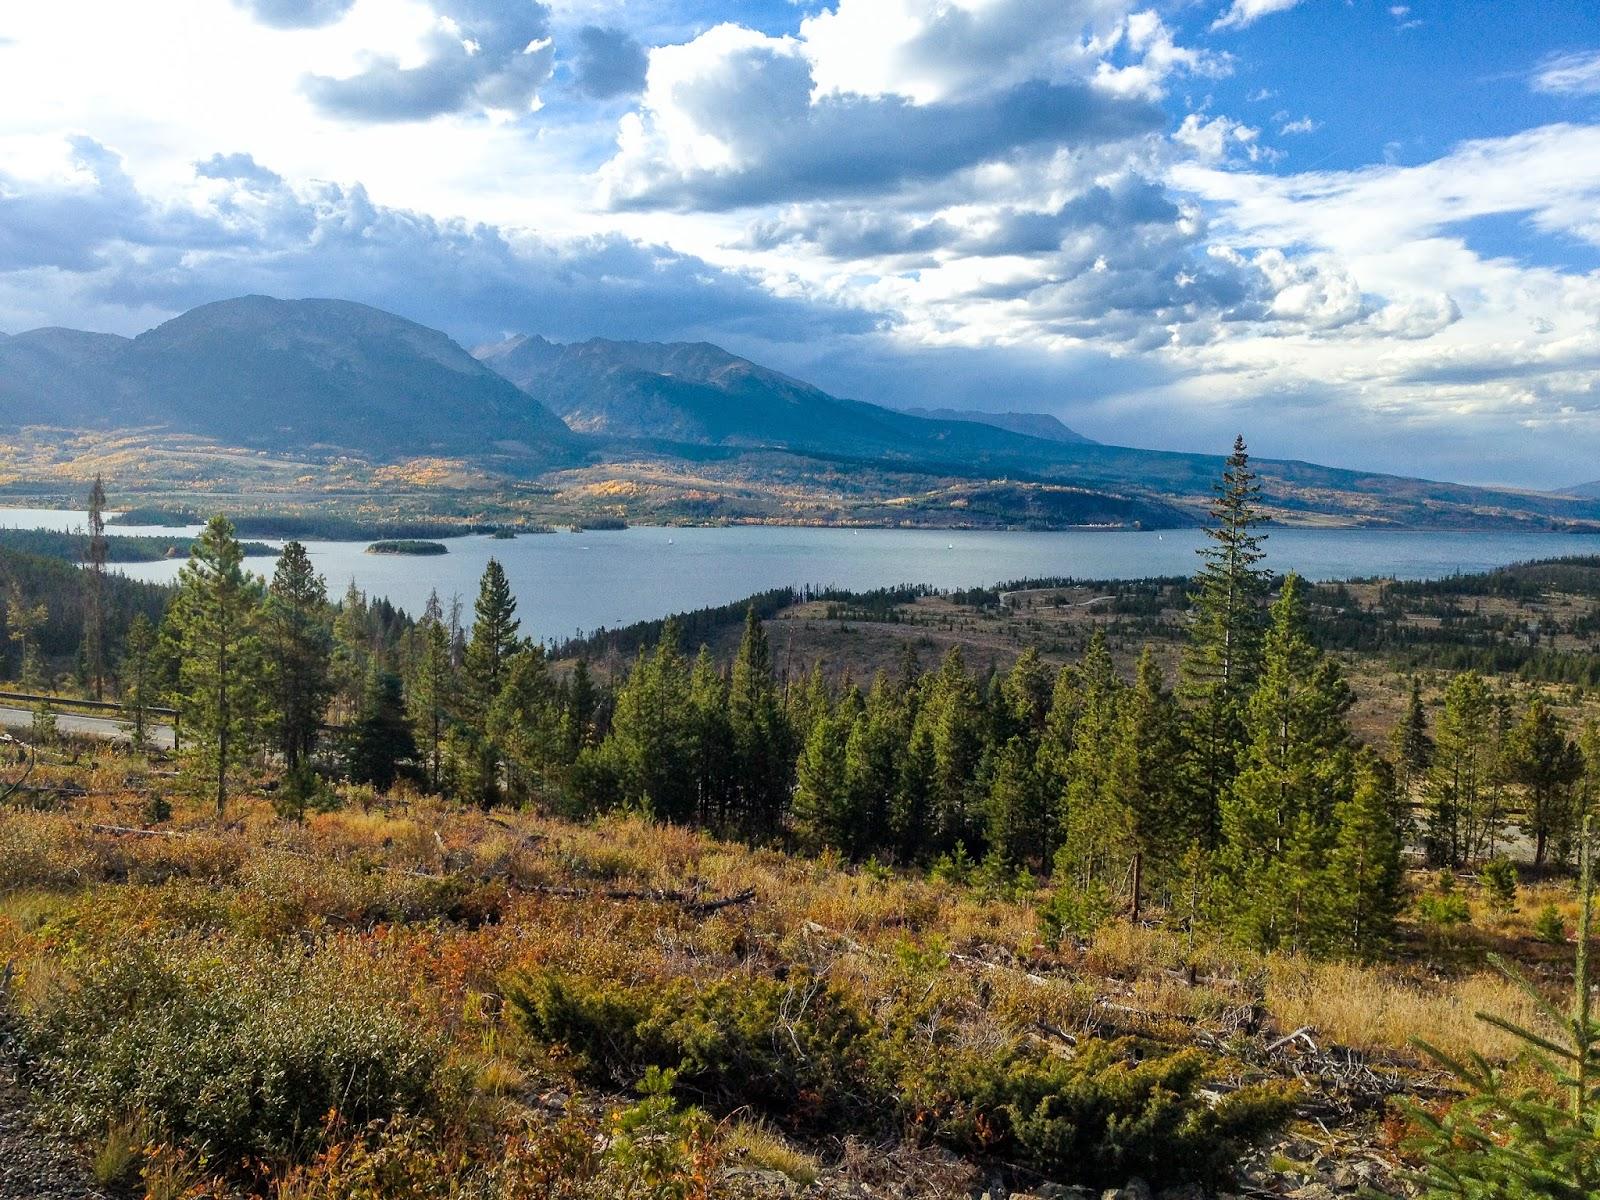 View over Lake Dillon